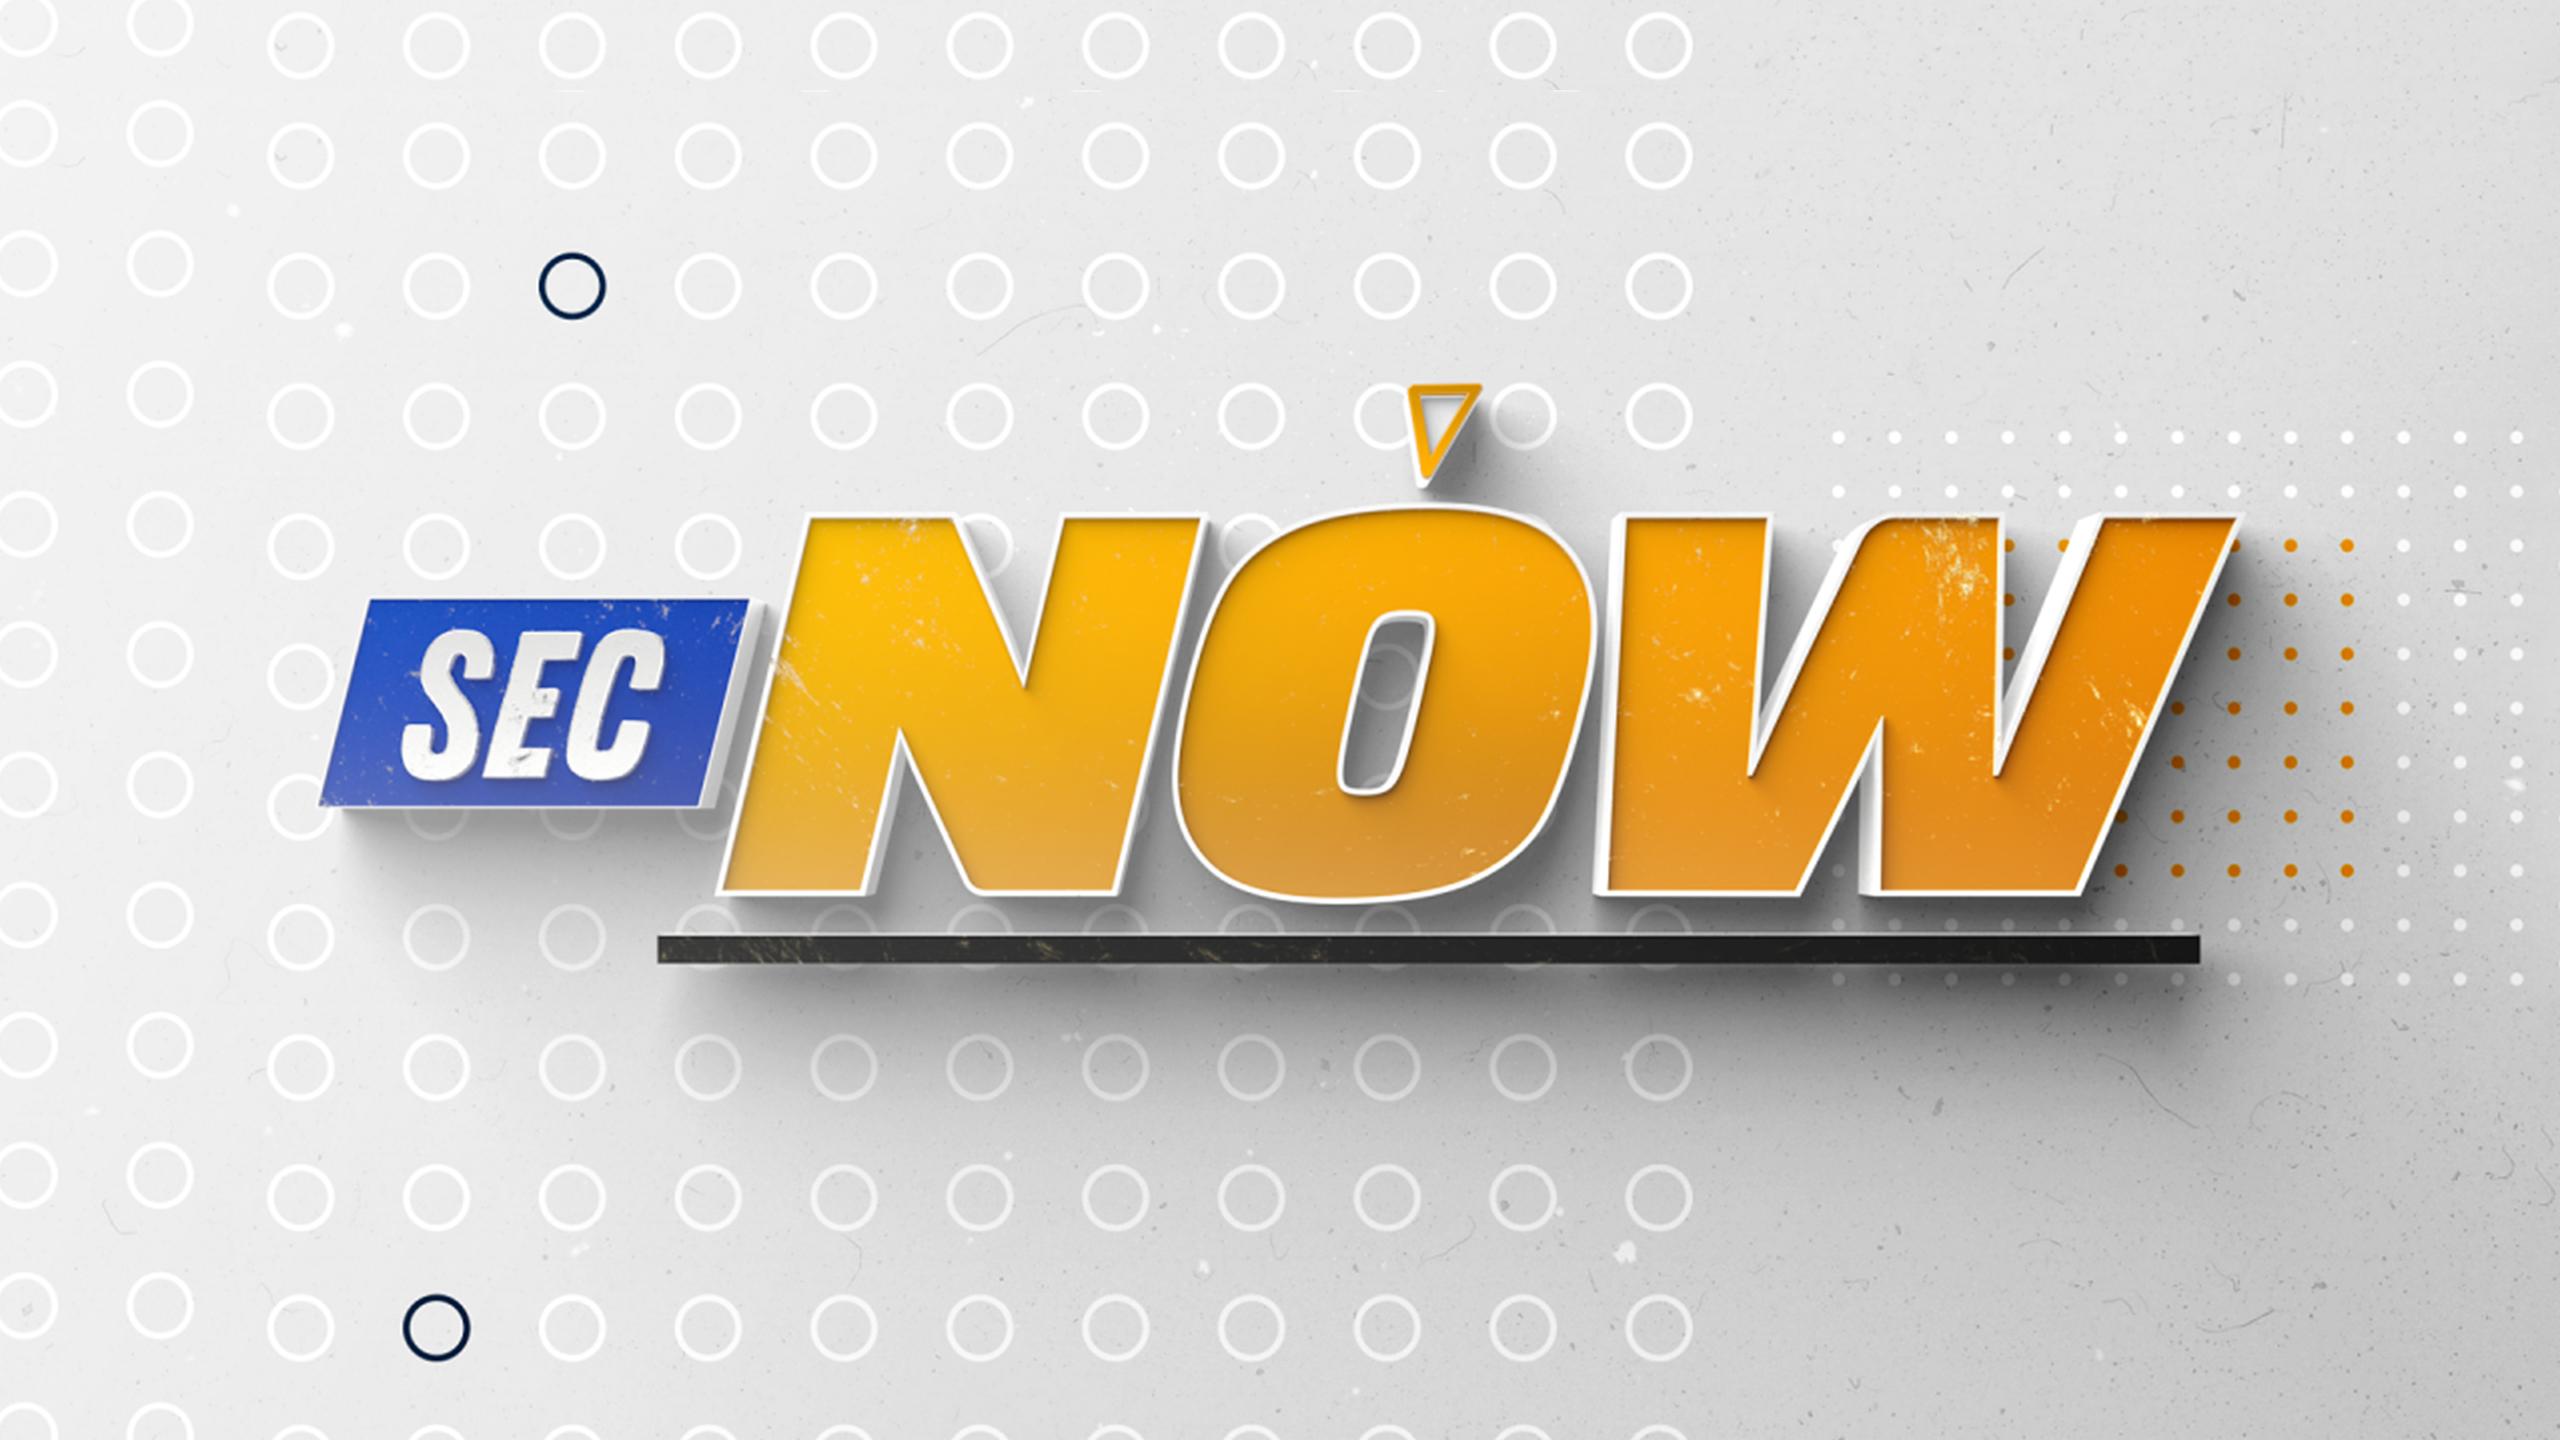 Mon, 12/17 - SEC Now